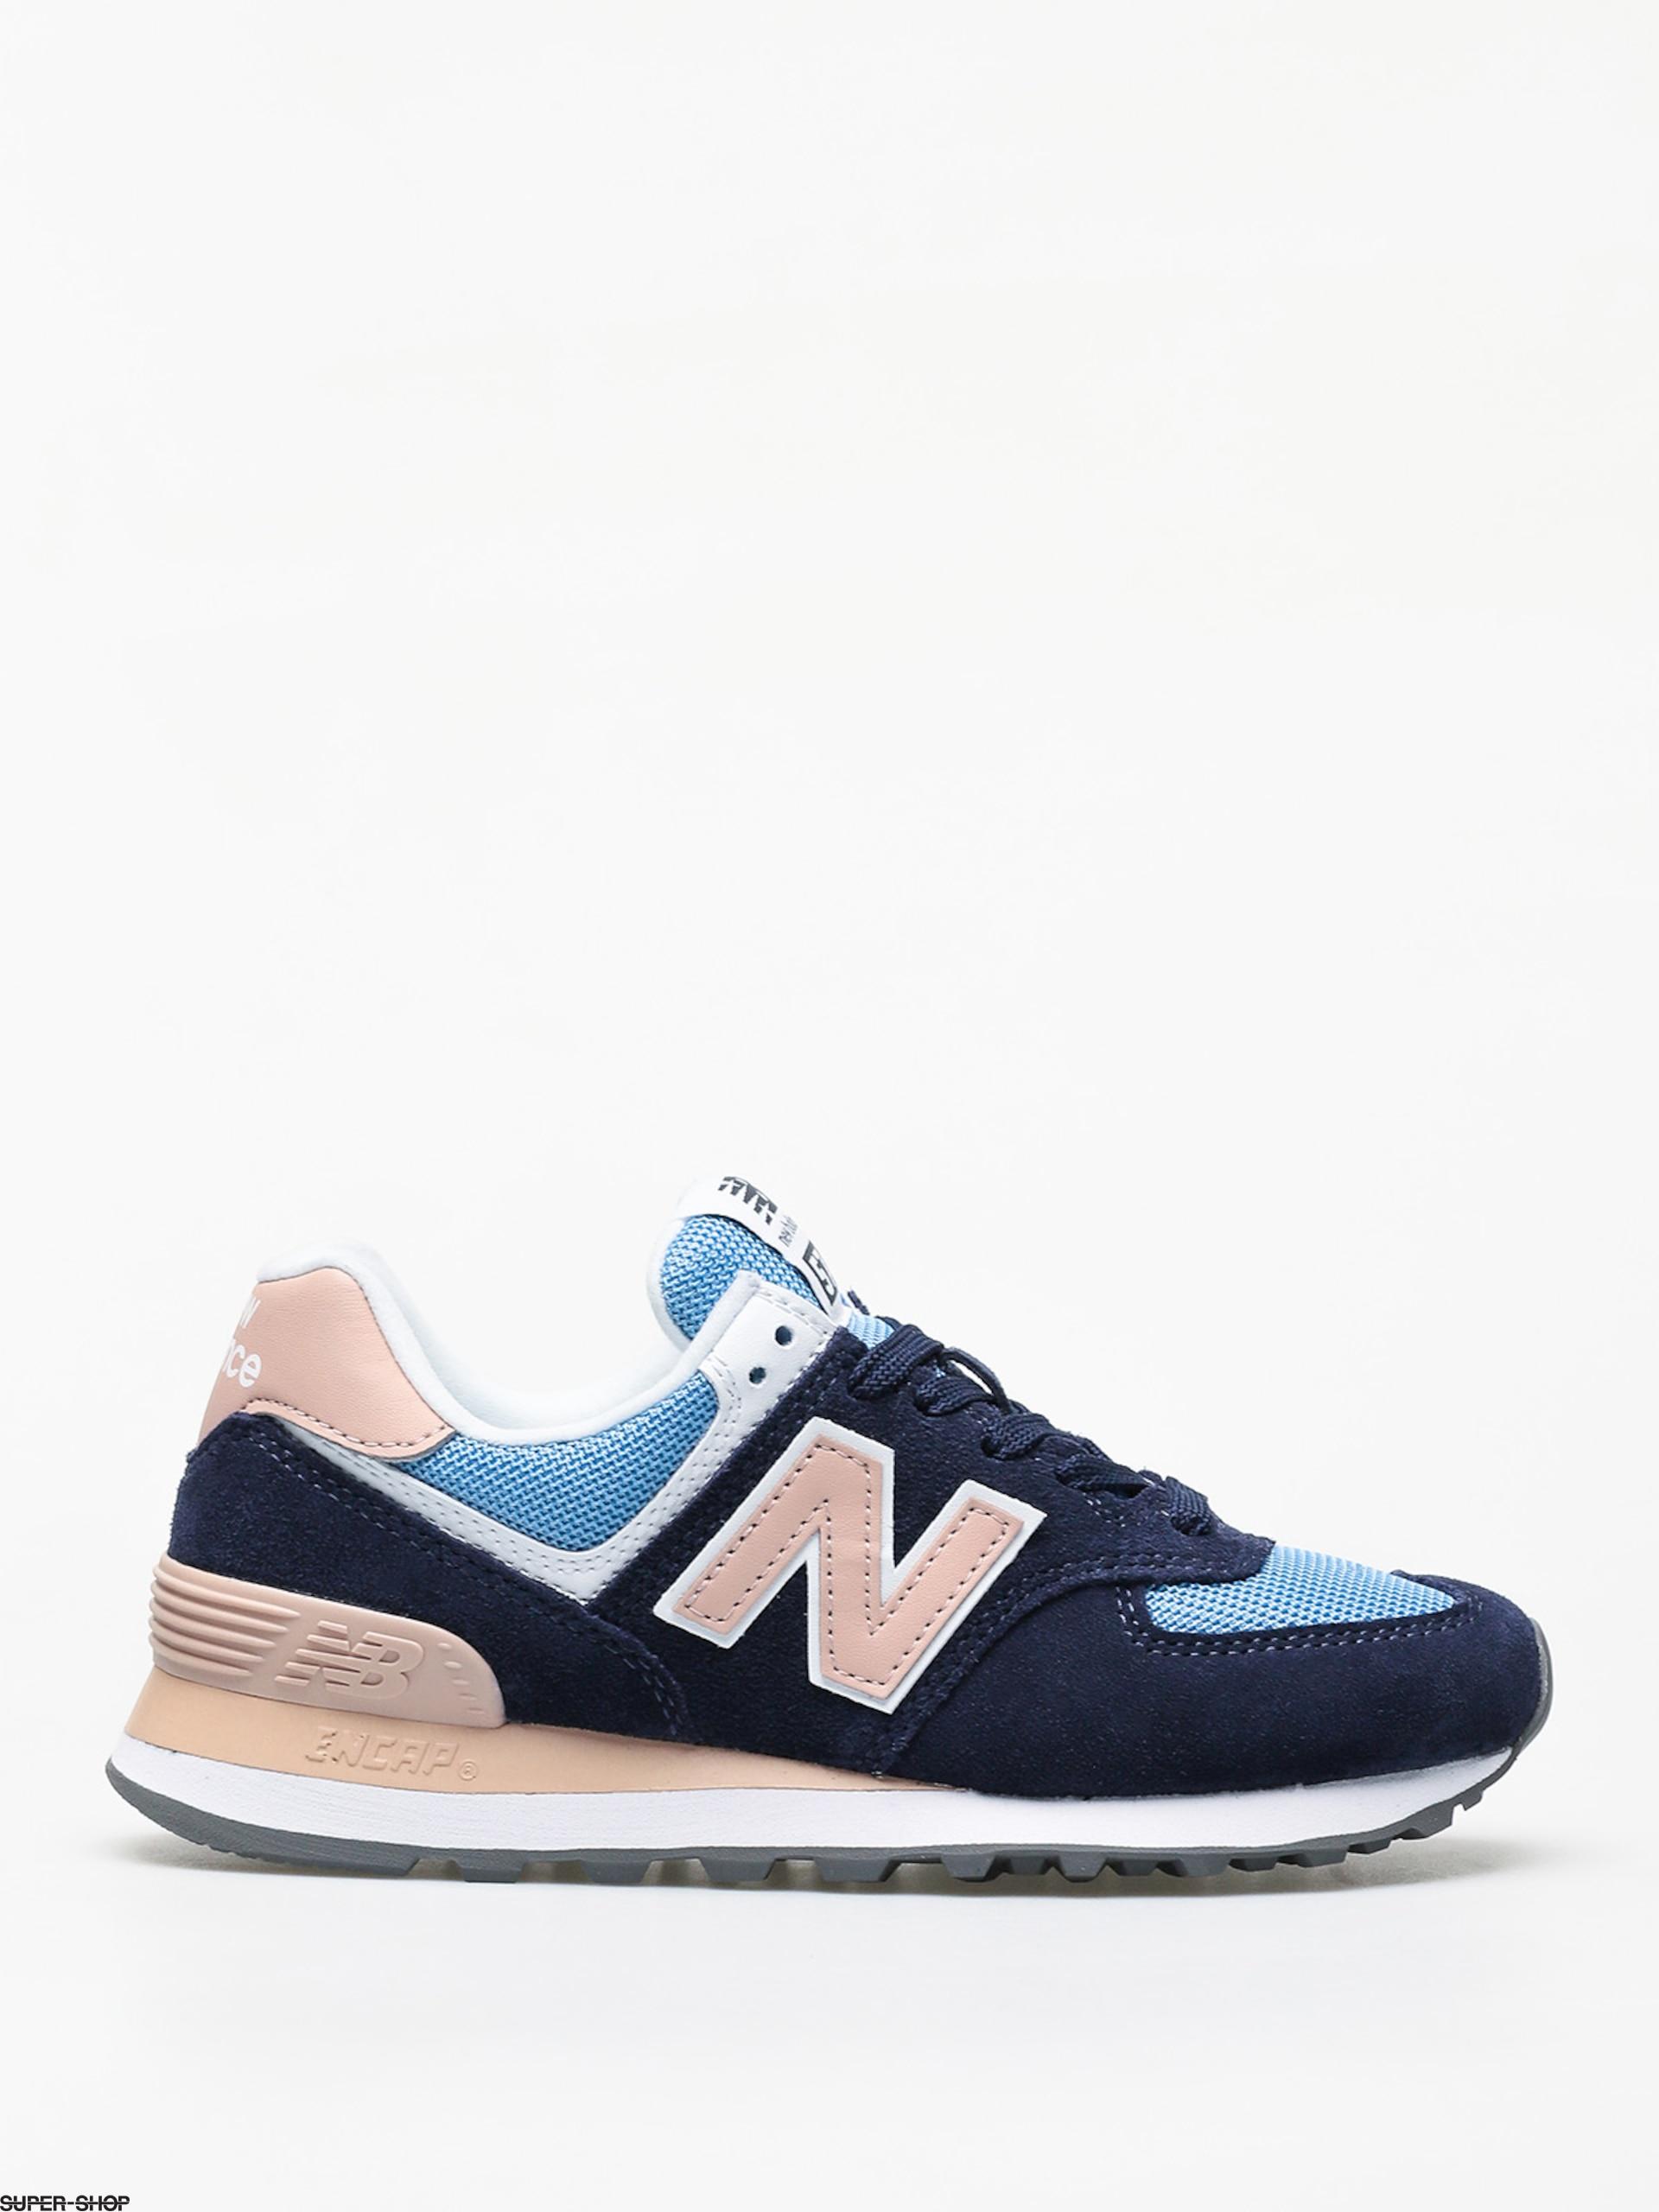 quality design c6b56 52157 New Balance 574 Shoes Wmn (navy/pink)